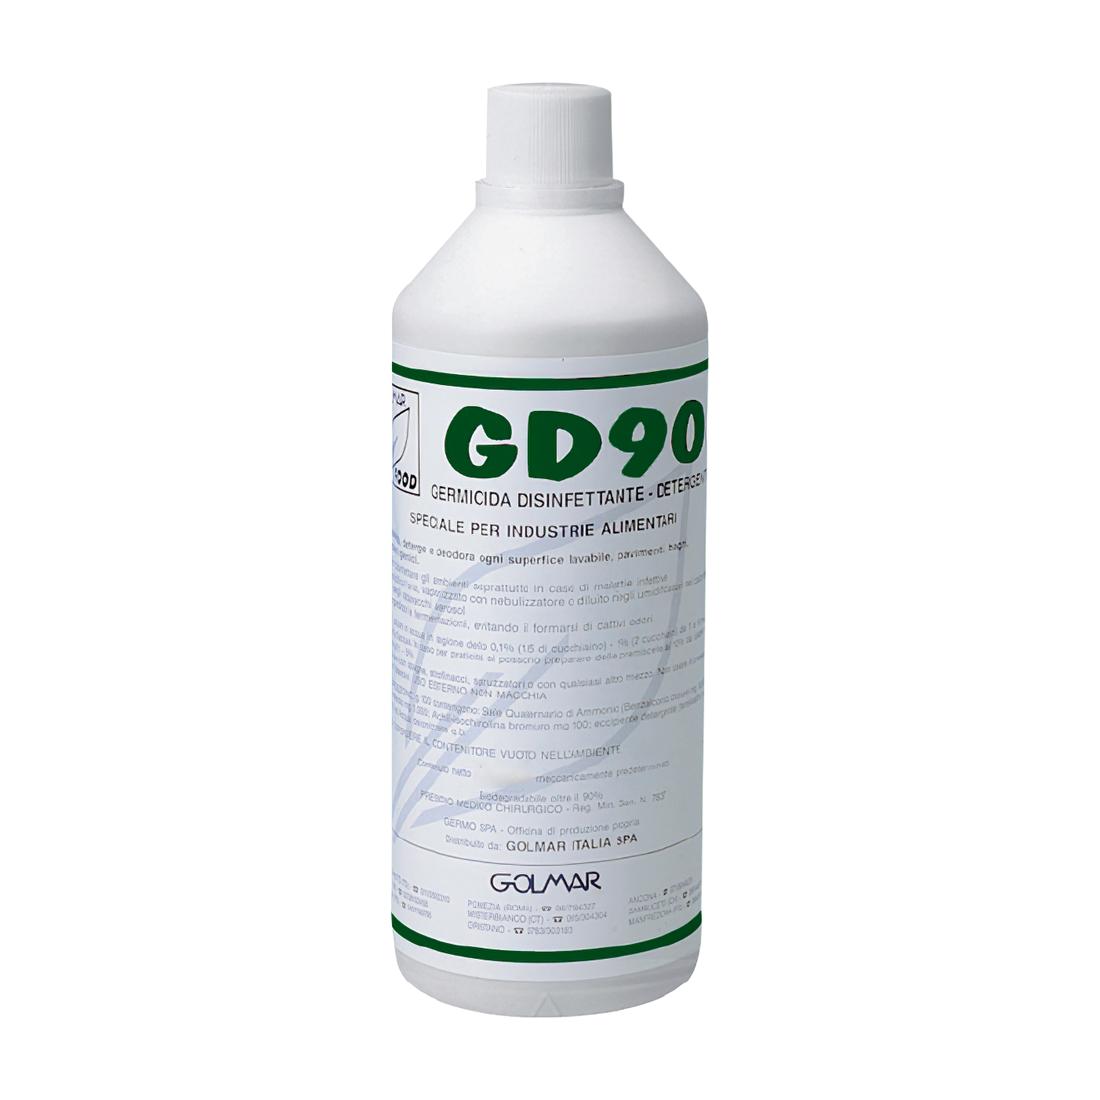 Golmar Disinfettante GD90